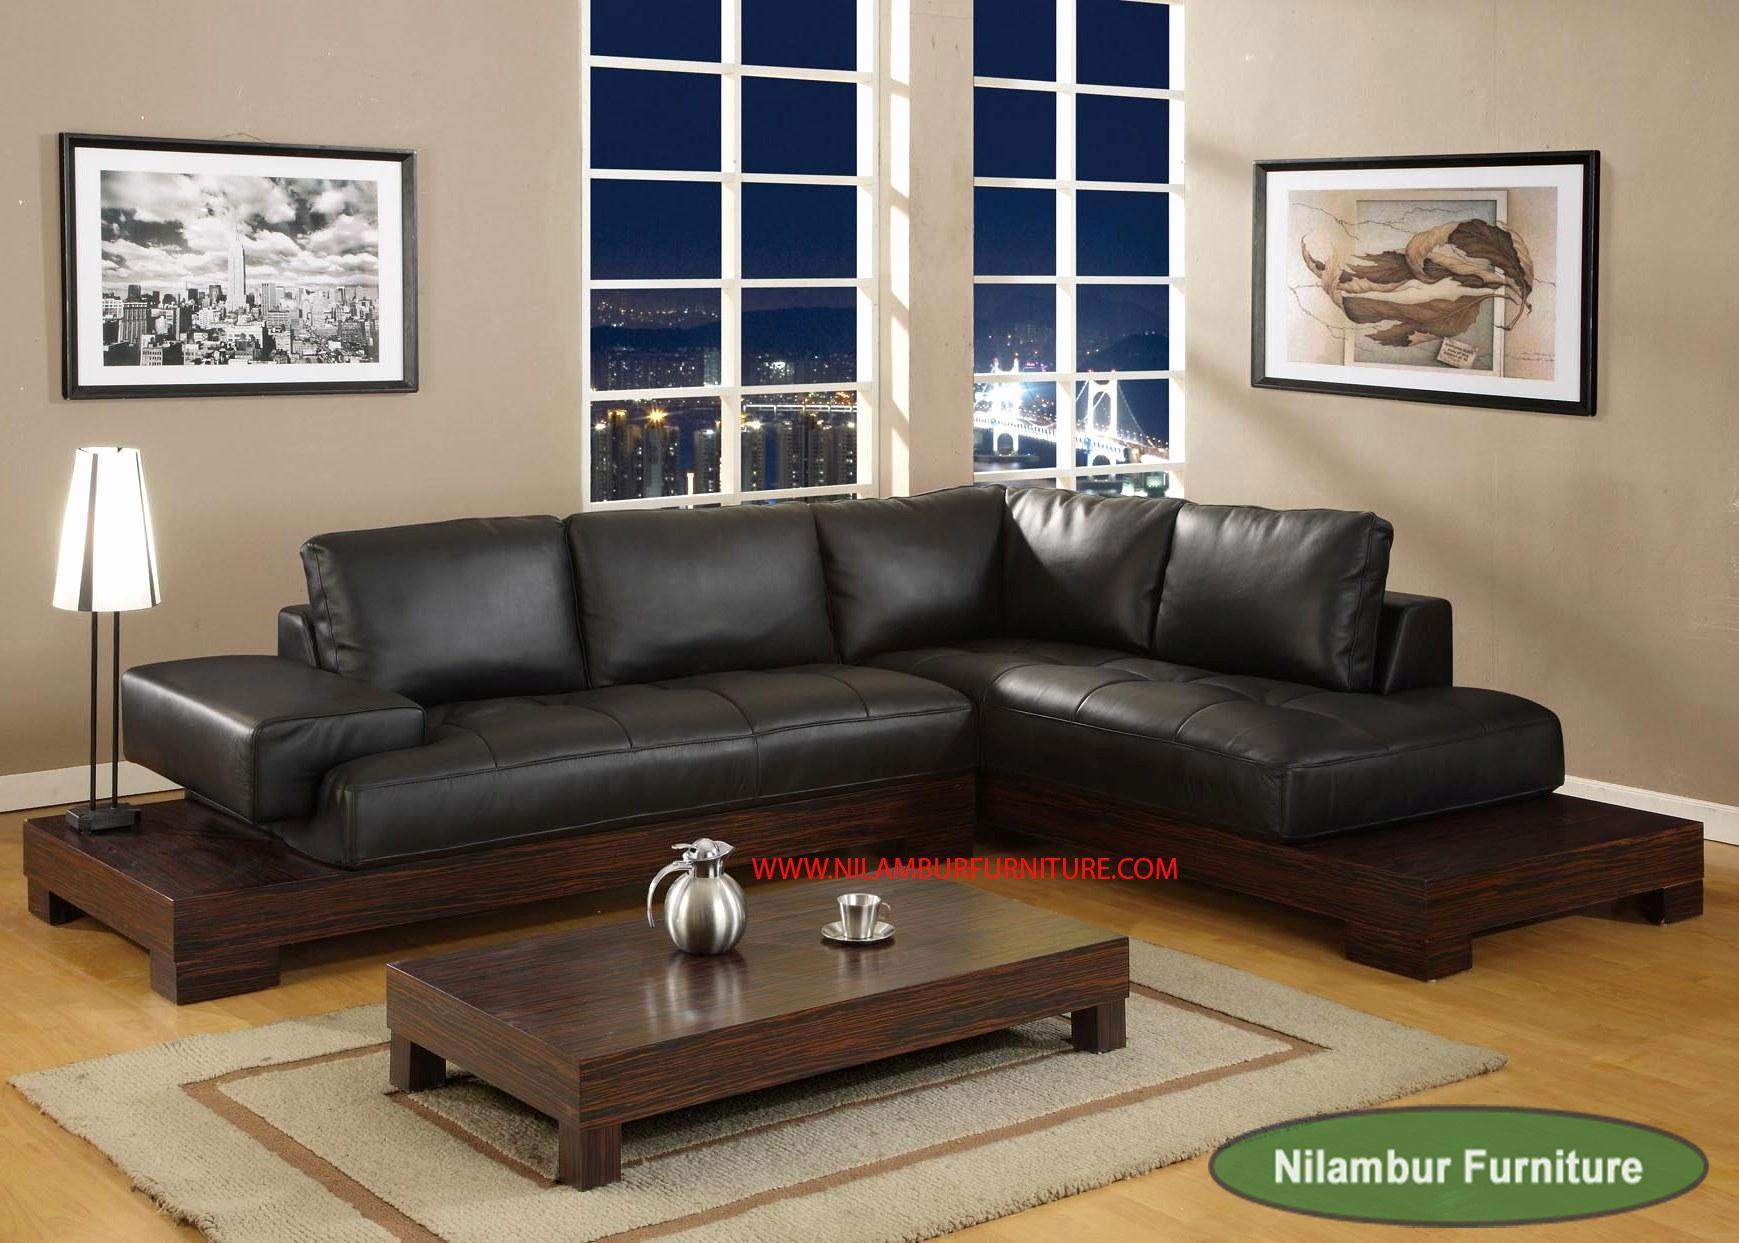 Living Room Furniture Kerala Living Room Leather Leather Sofa Decor Black Furniture Living Room